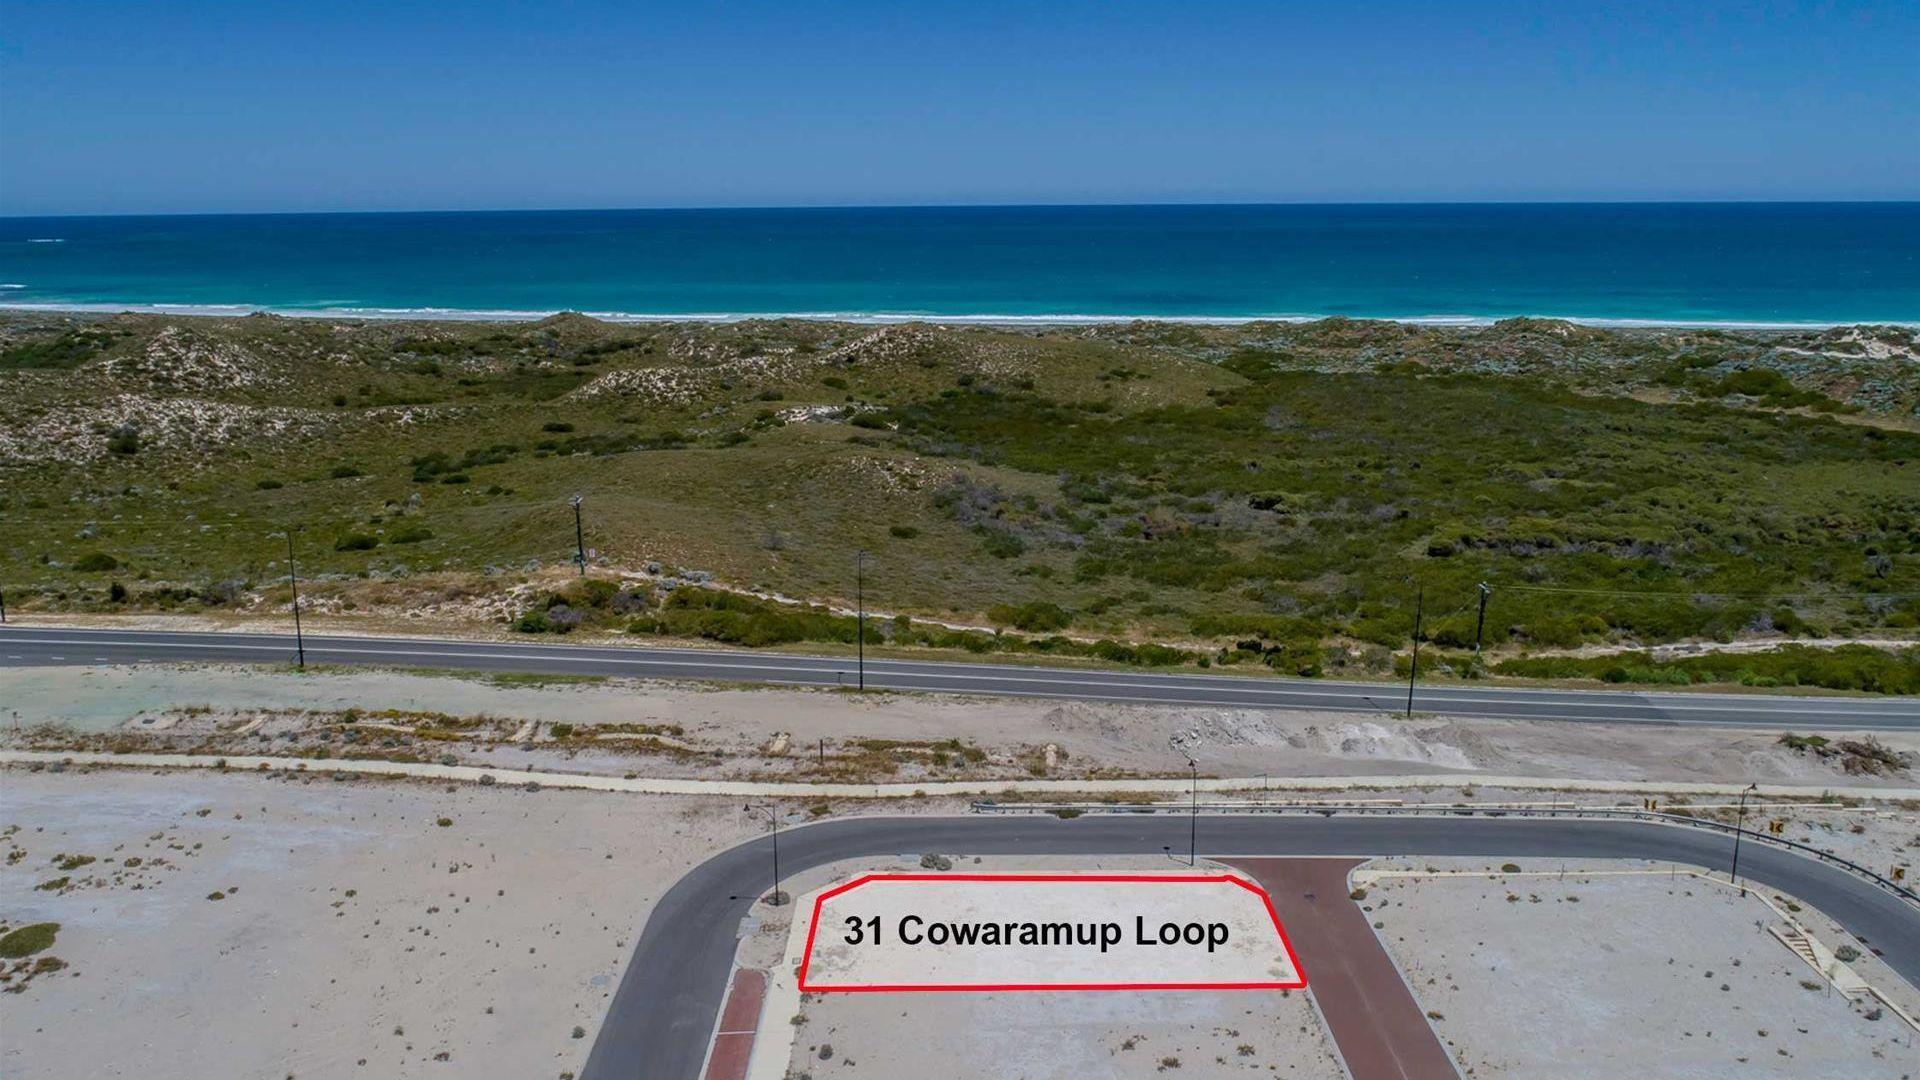 31 Cowaramup Loop, Two Rocks WA 6037, Image 1